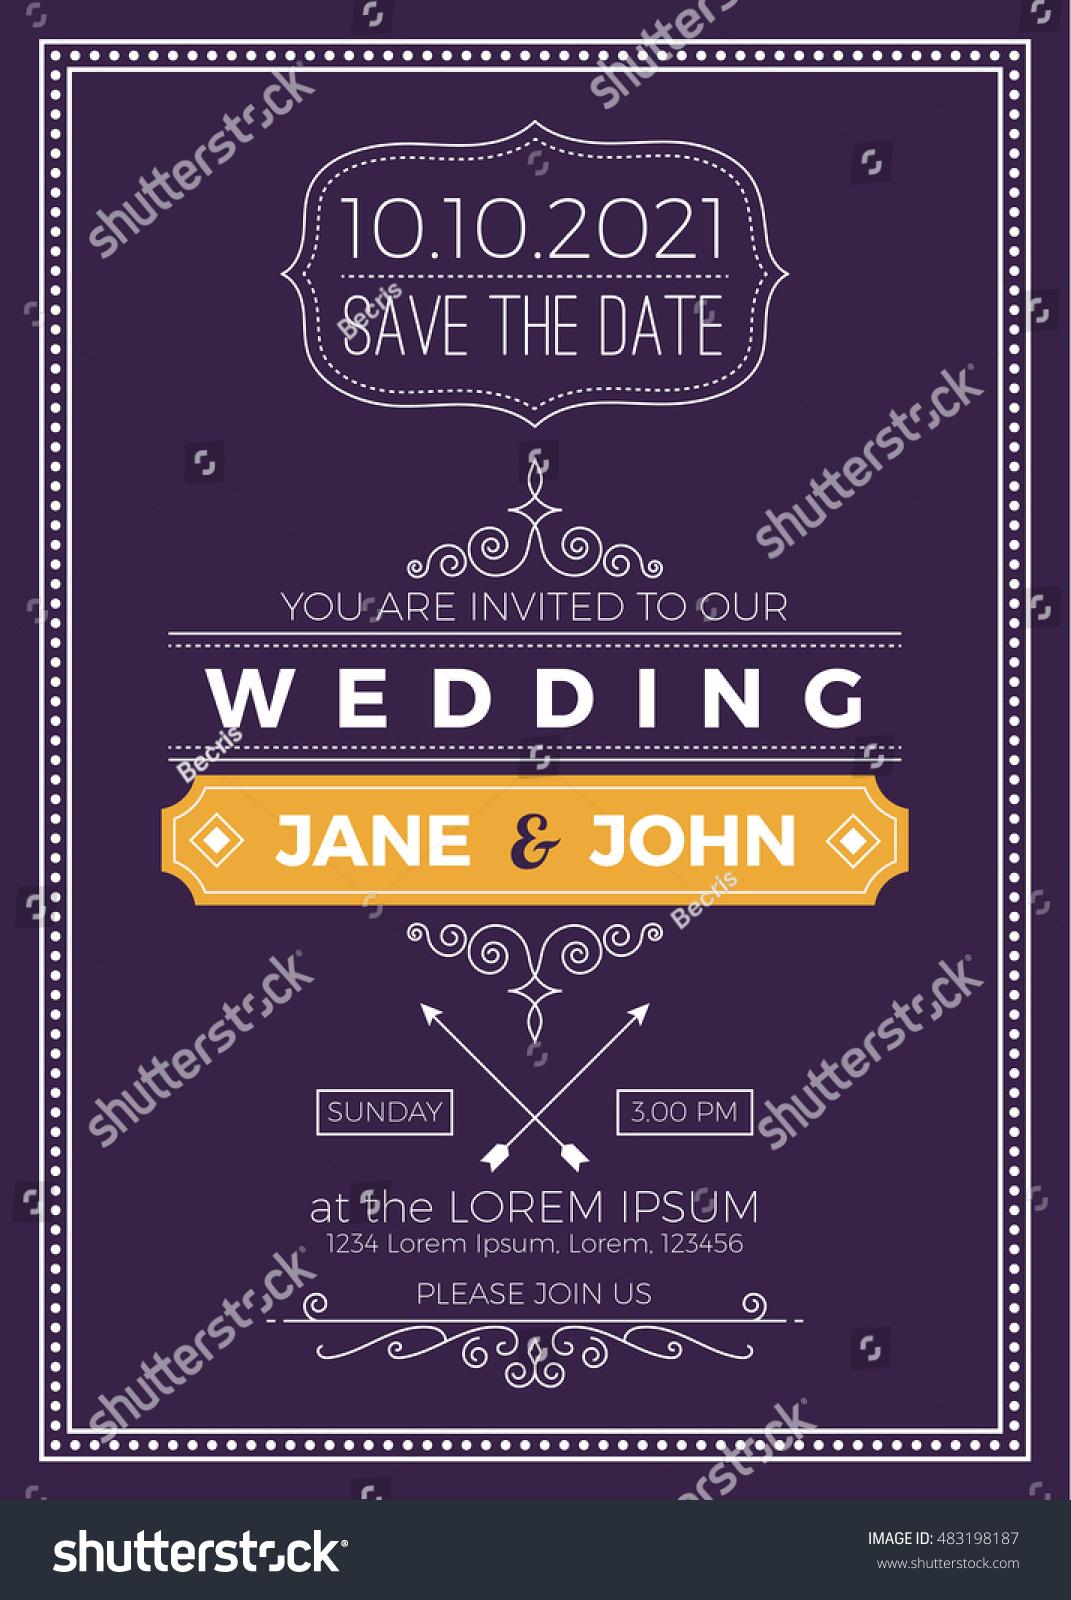 Vintage Wedding Invitation Card A 5 Size Image Vectorielle De Stock